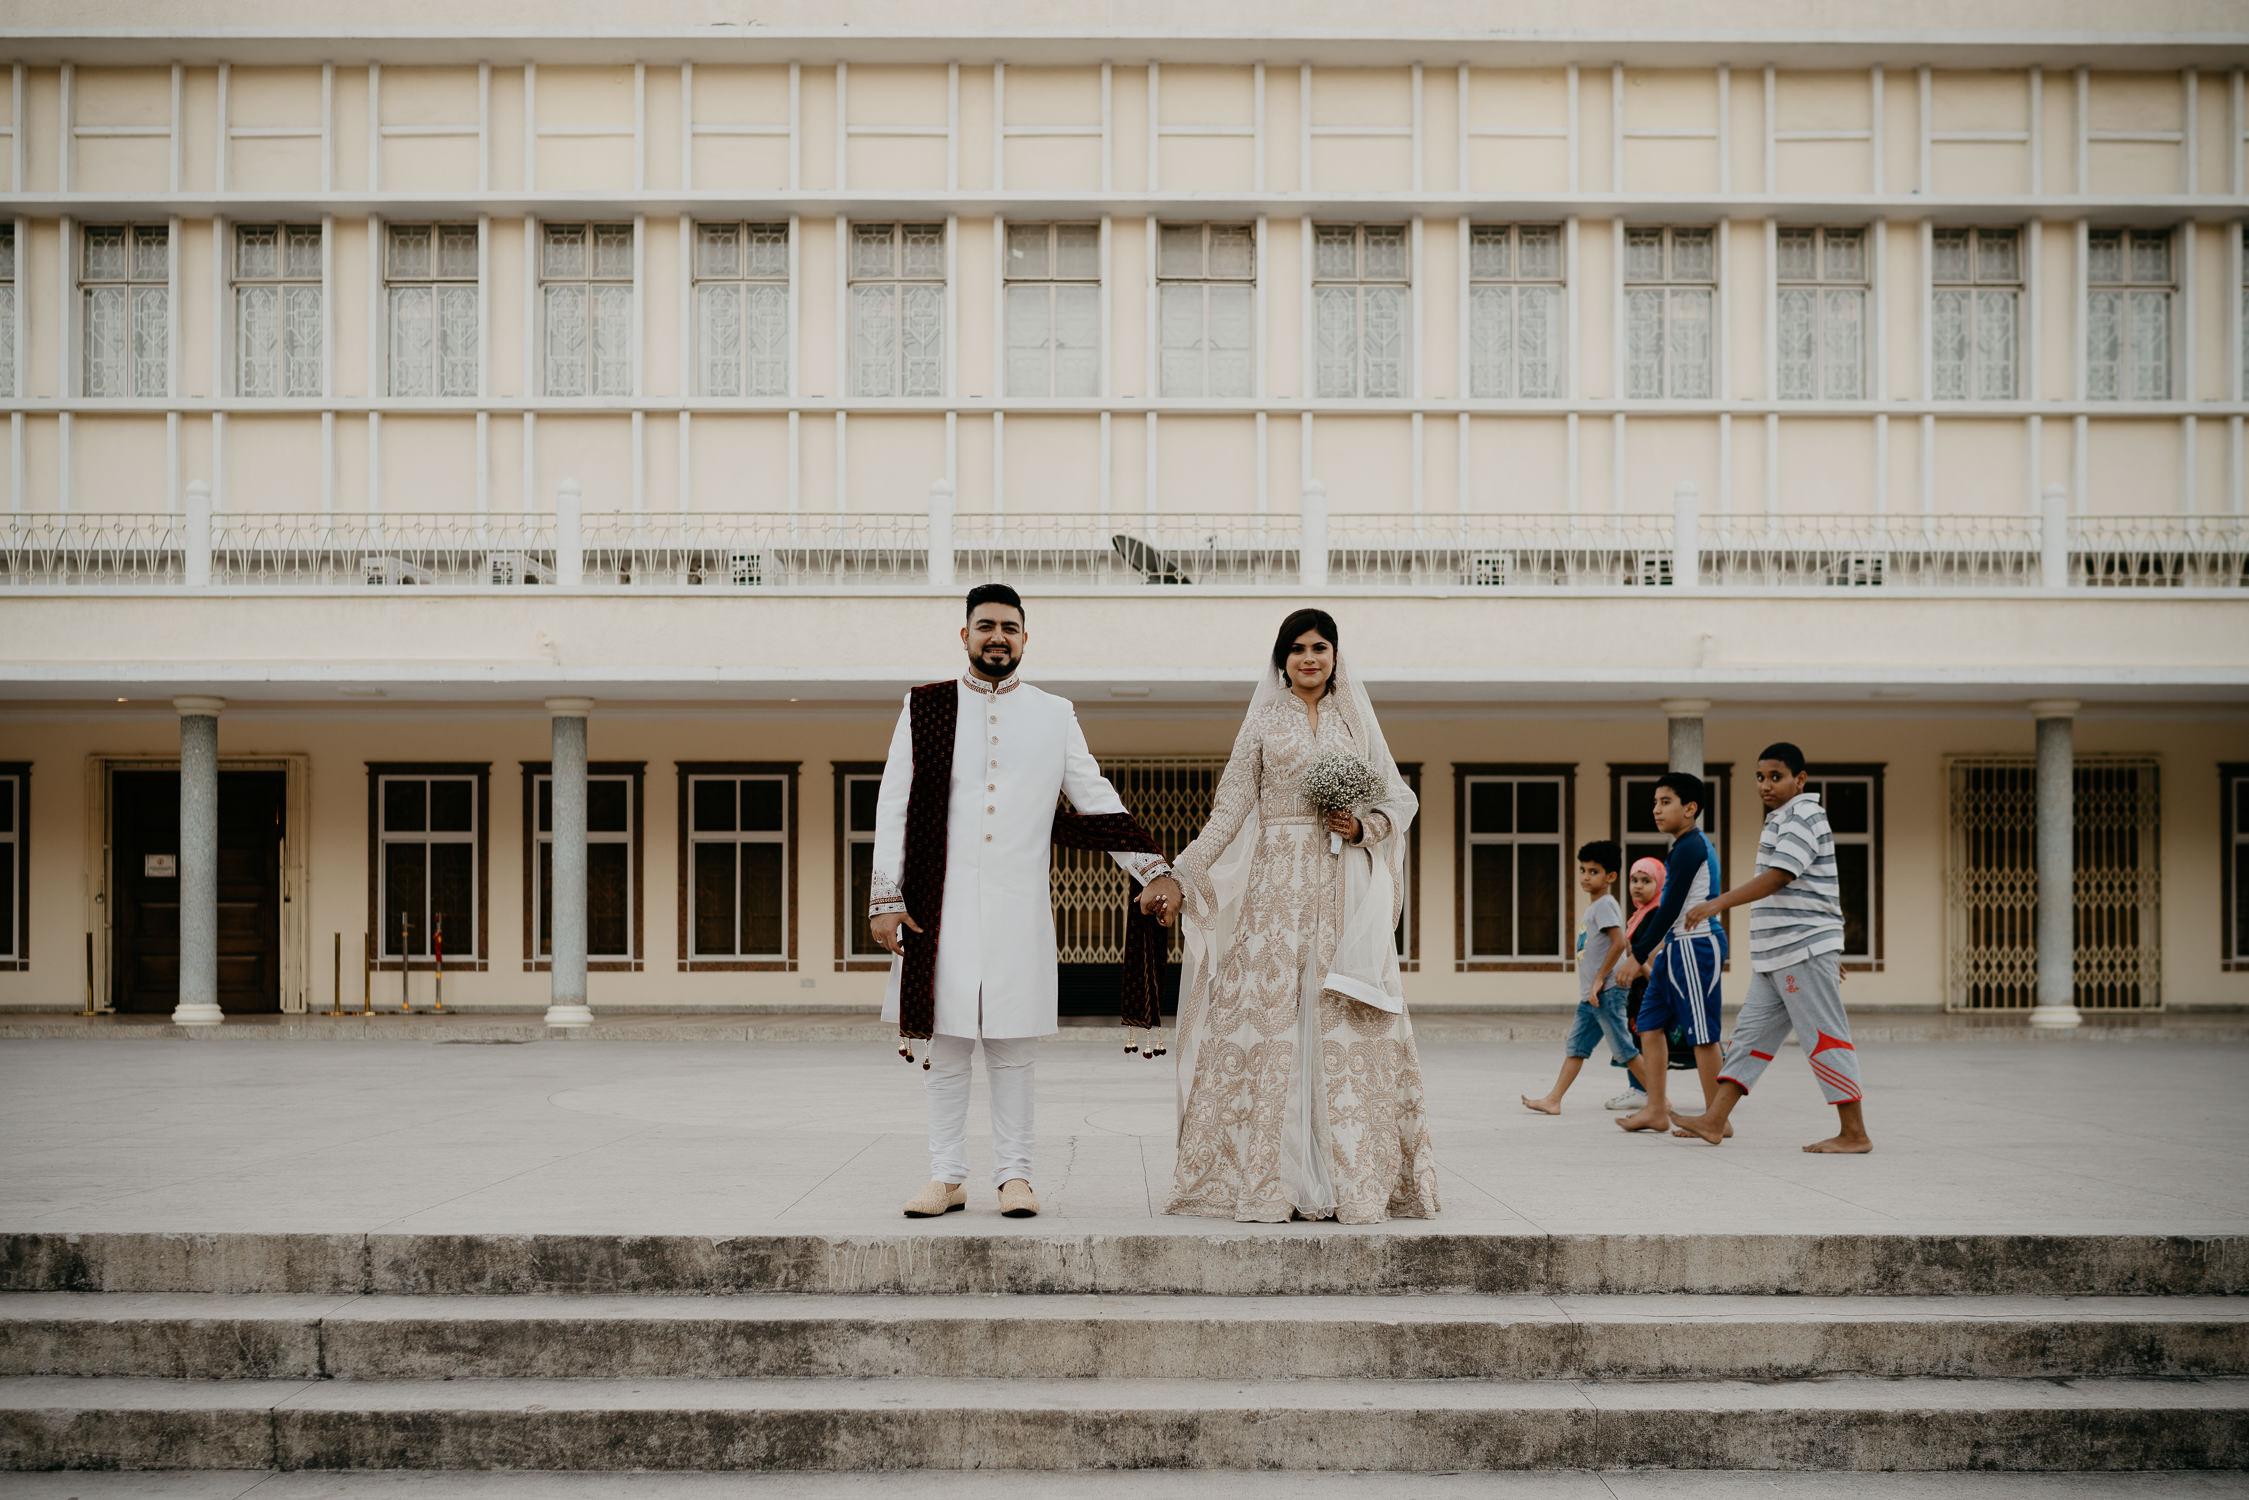 amsterdam wedding photographer-Aqil Benazir-397.jpg